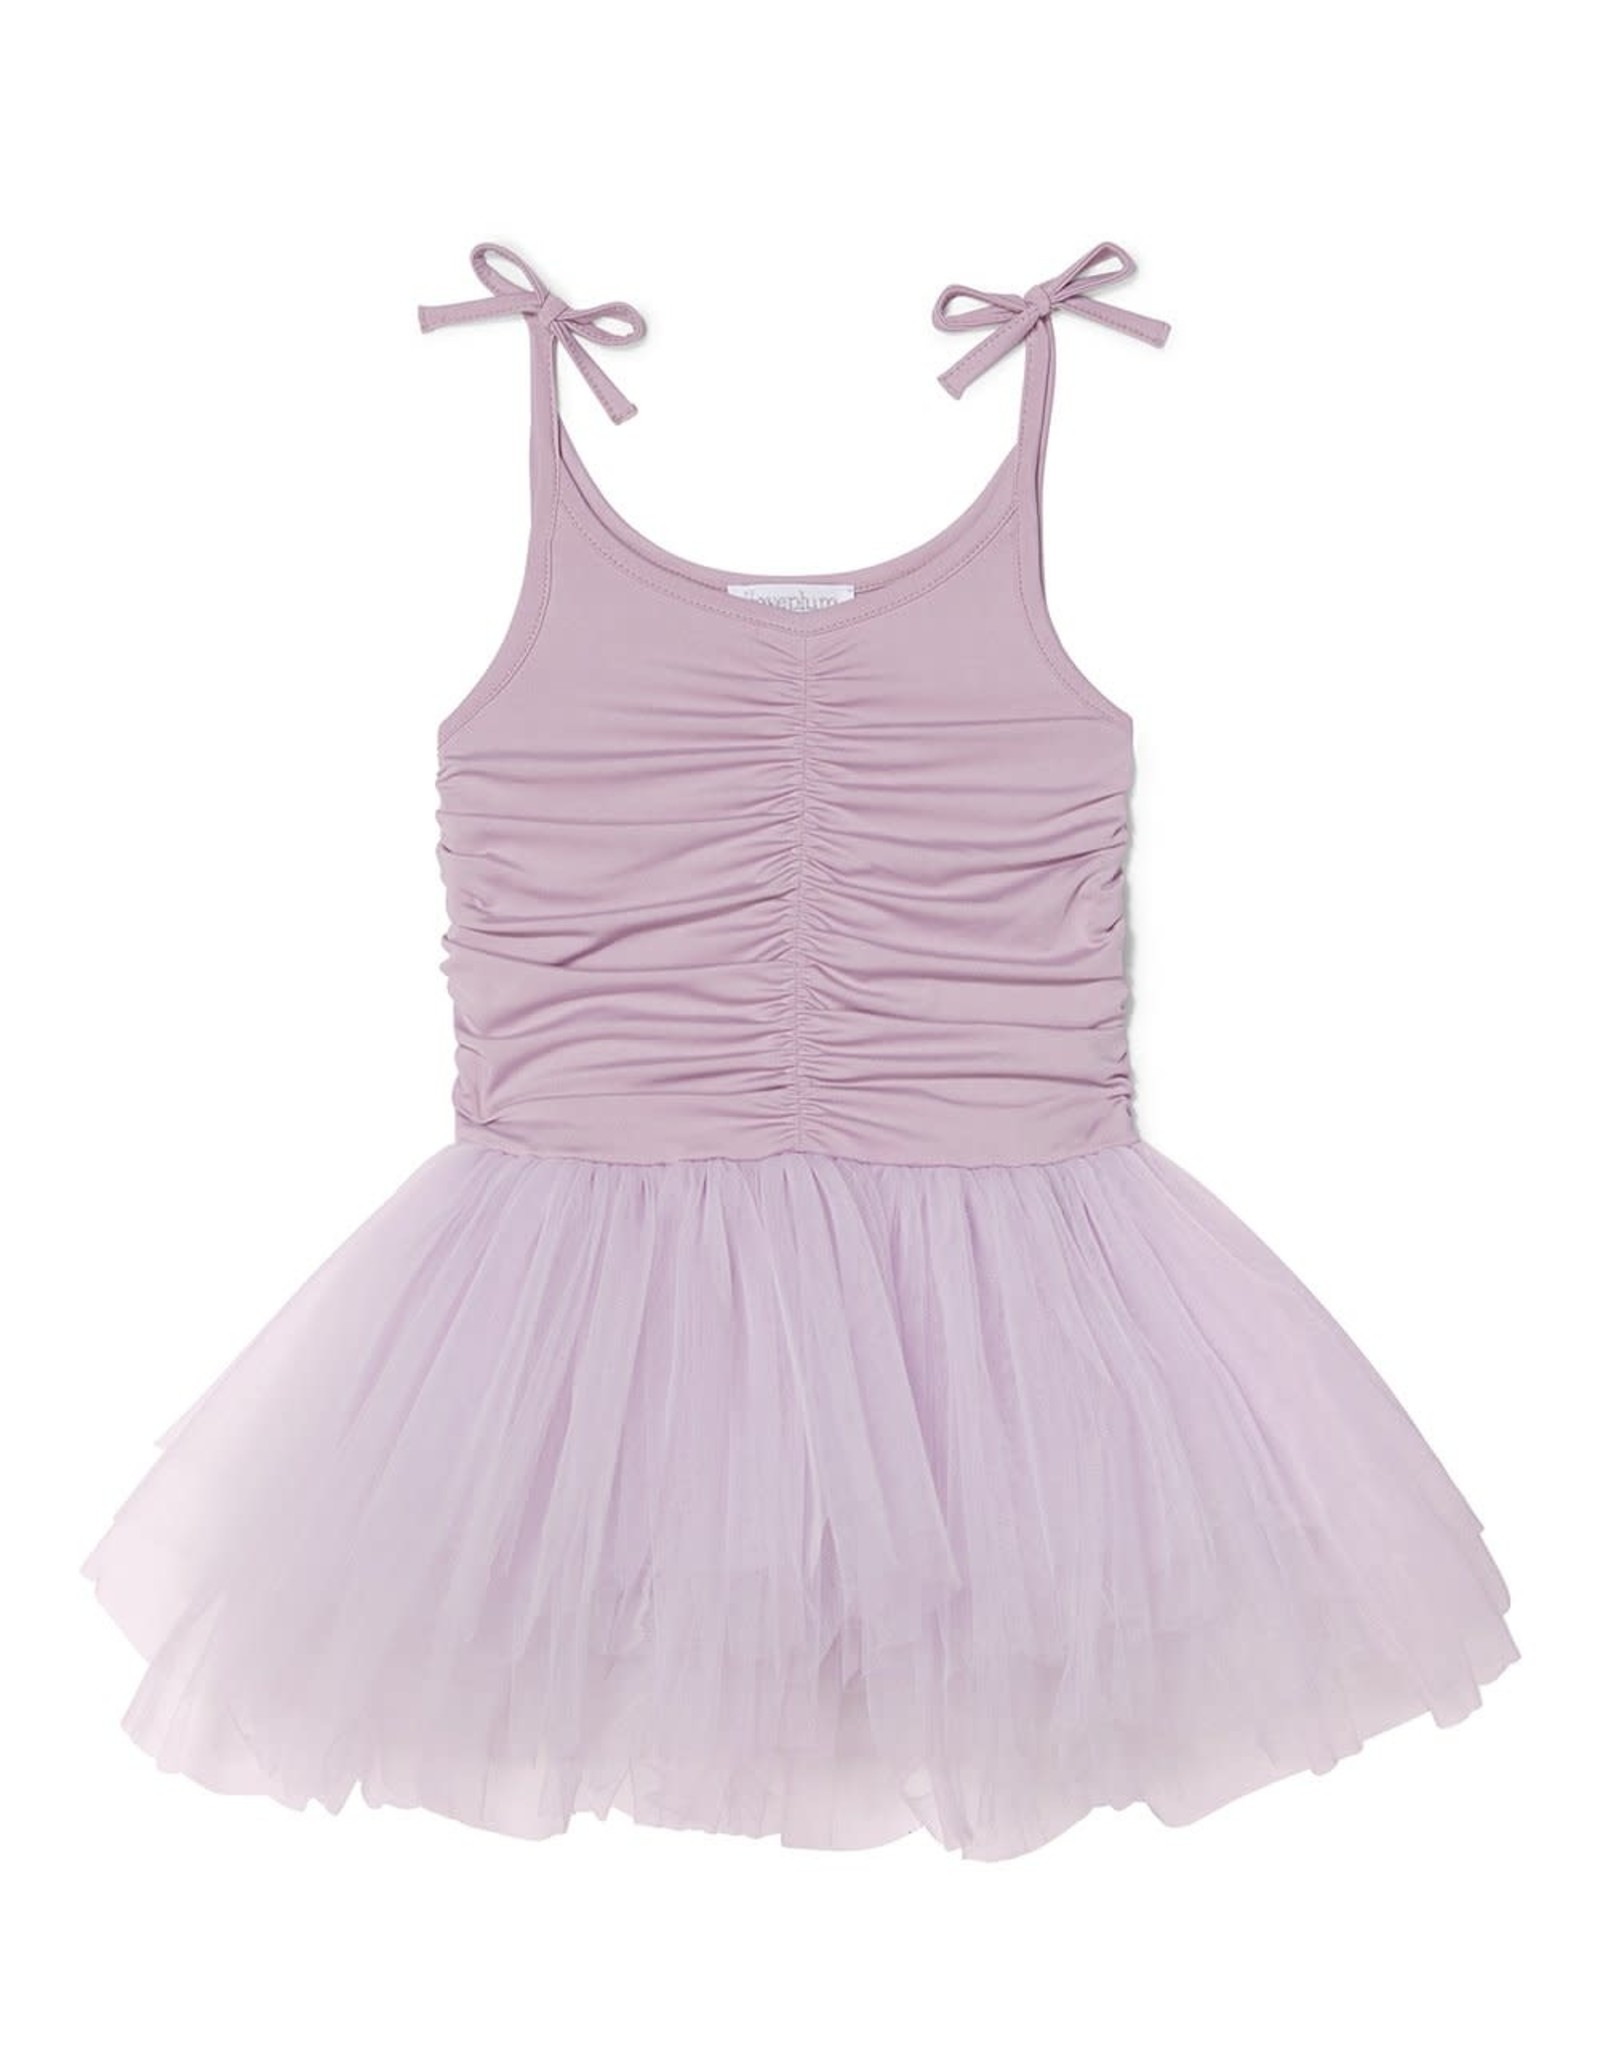 iloveplum iloveplum B. B. Tutu Dress